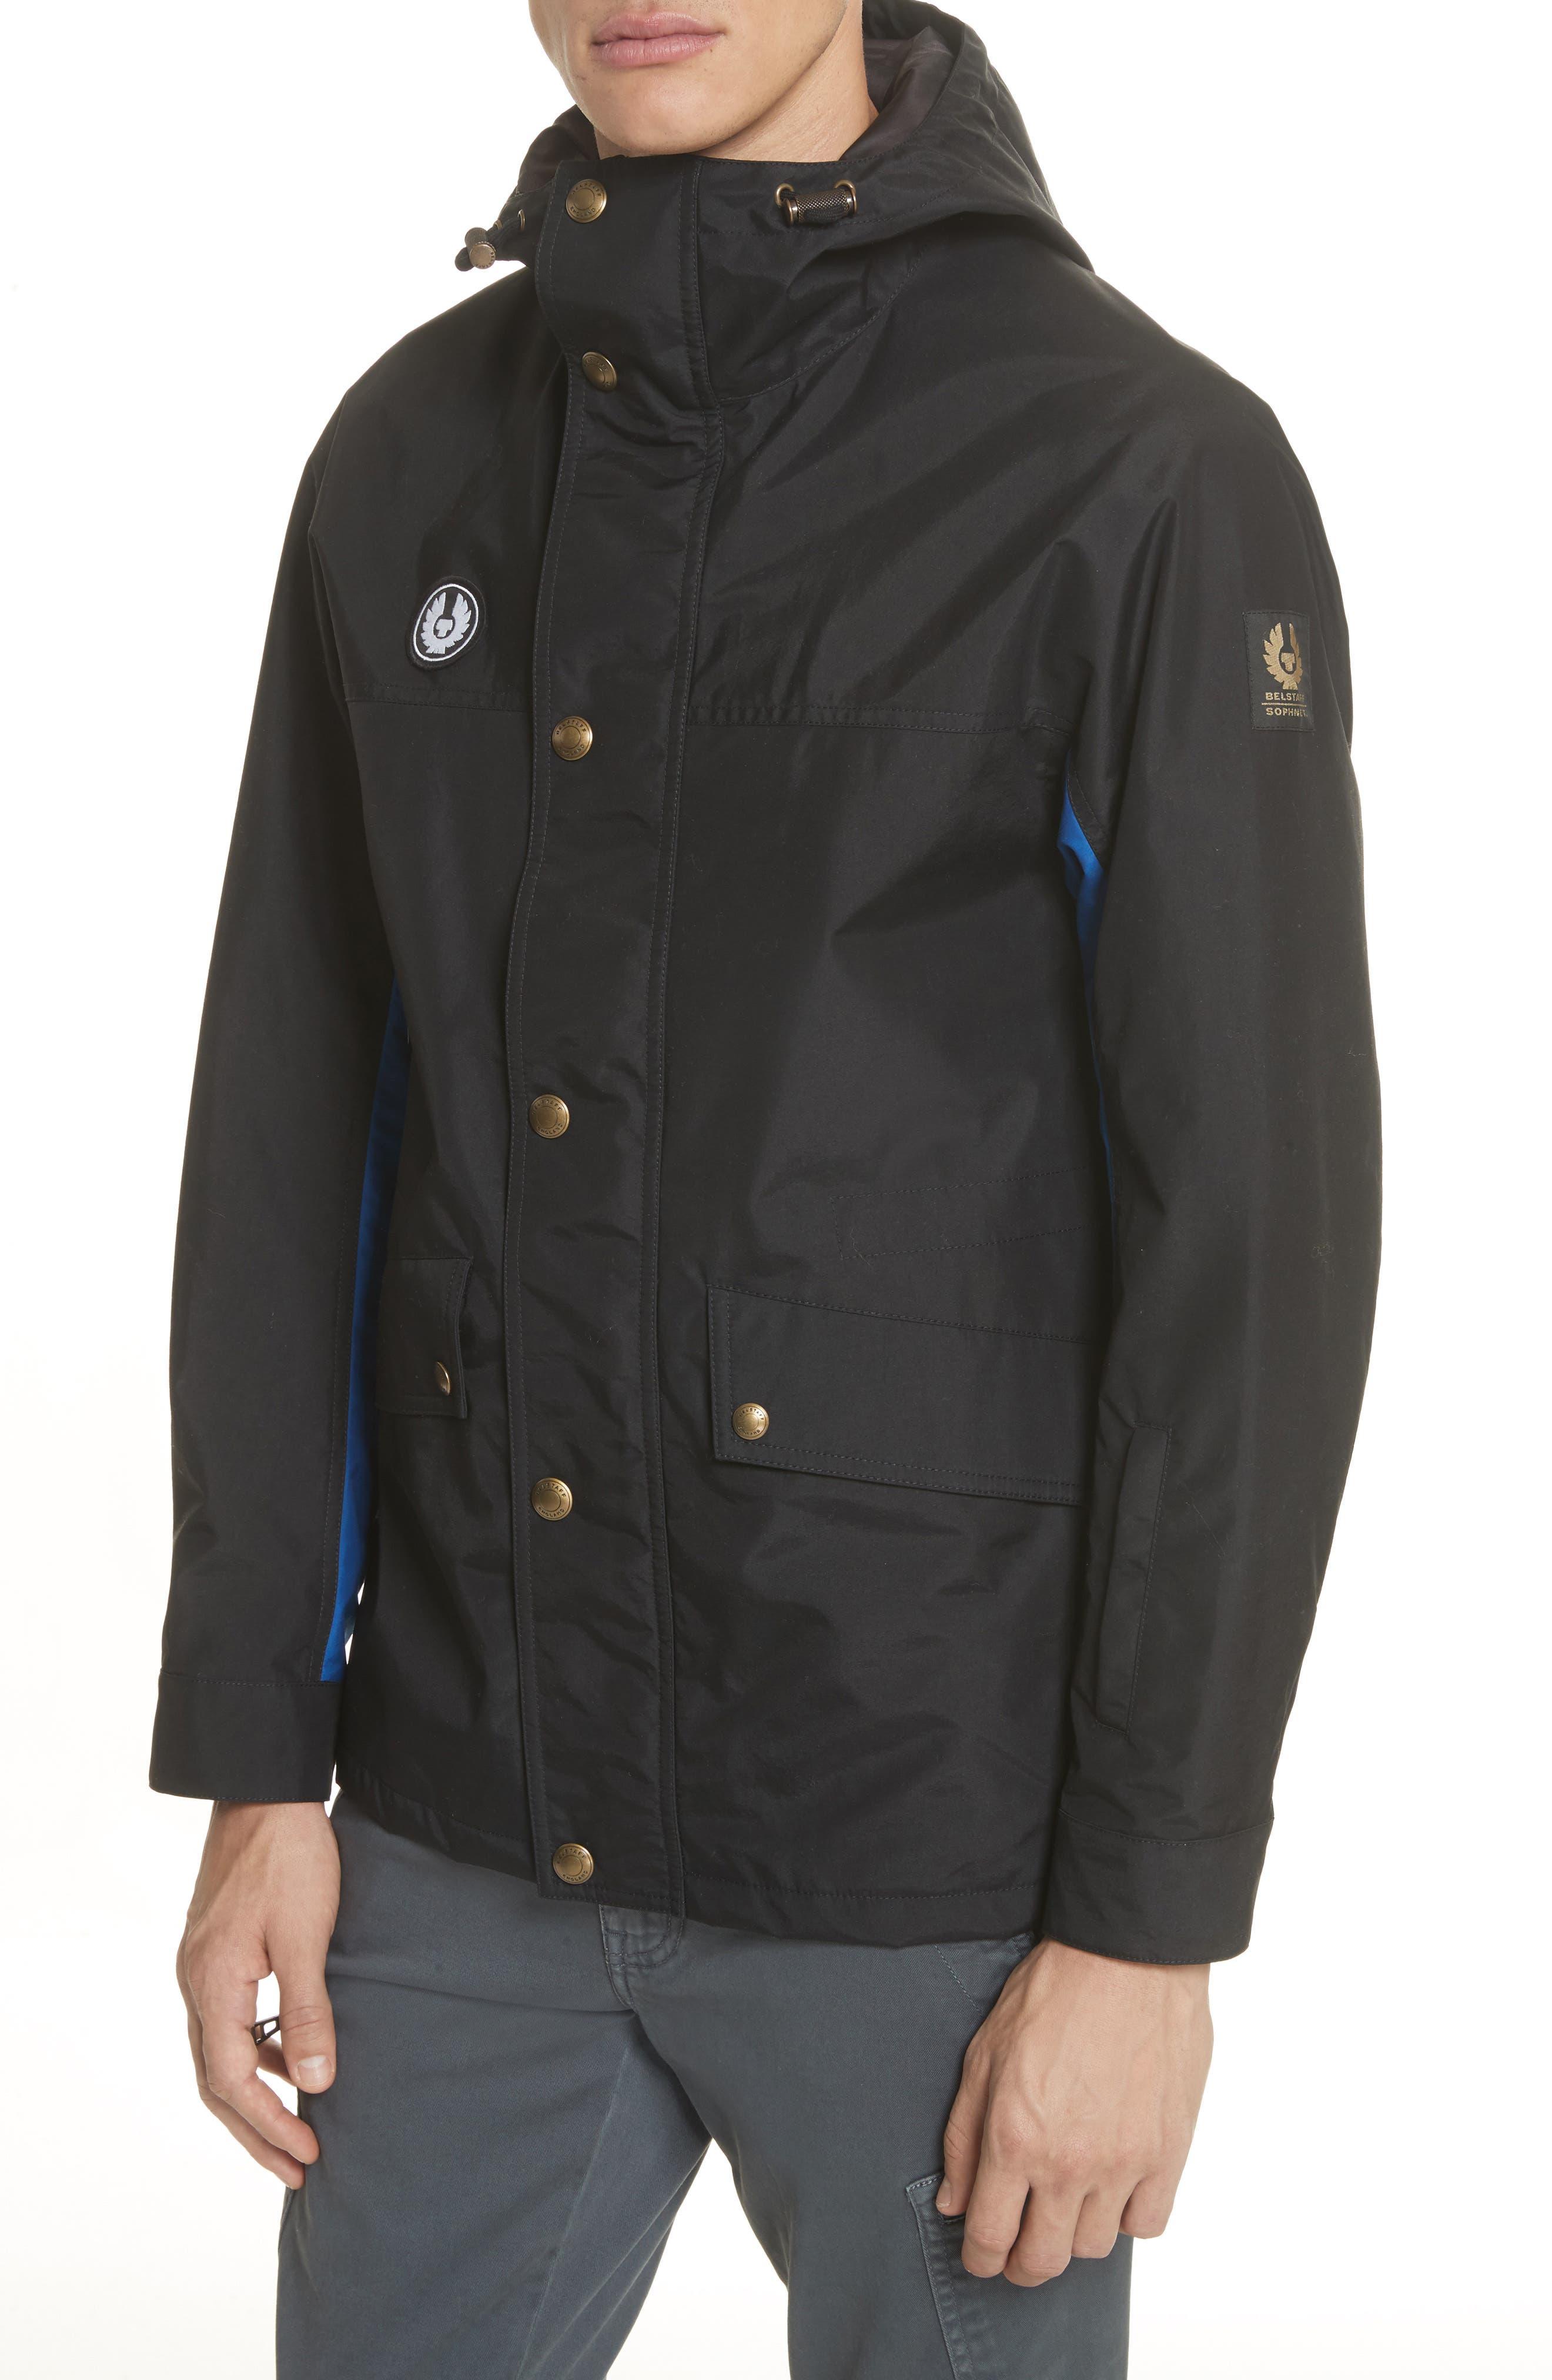 Kersbrook BXS Nylon Jacket,                             Alternate thumbnail 4, color,                             Black